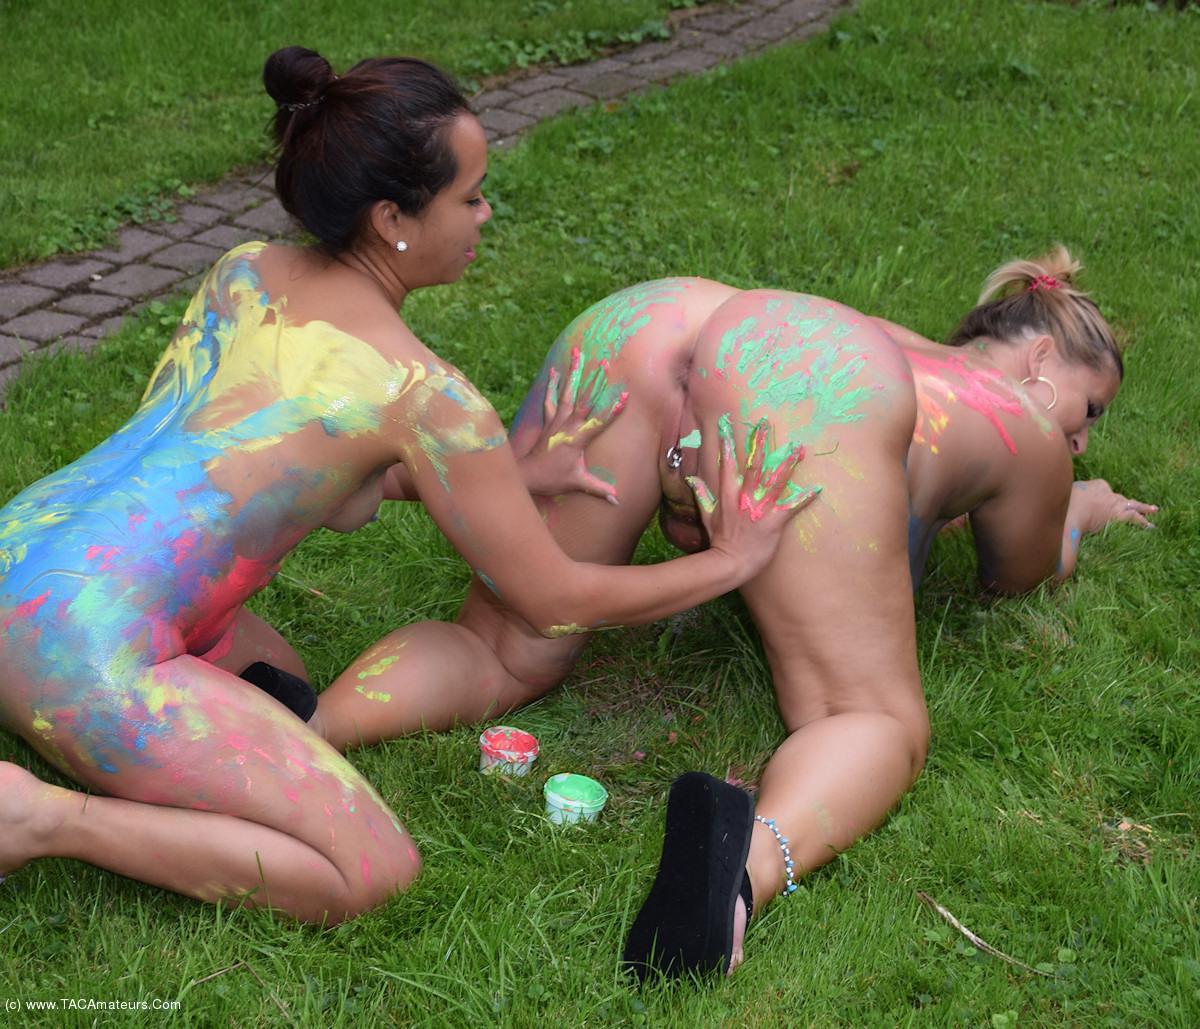 NudeChrissy - Body Painting Pt3 scene 2